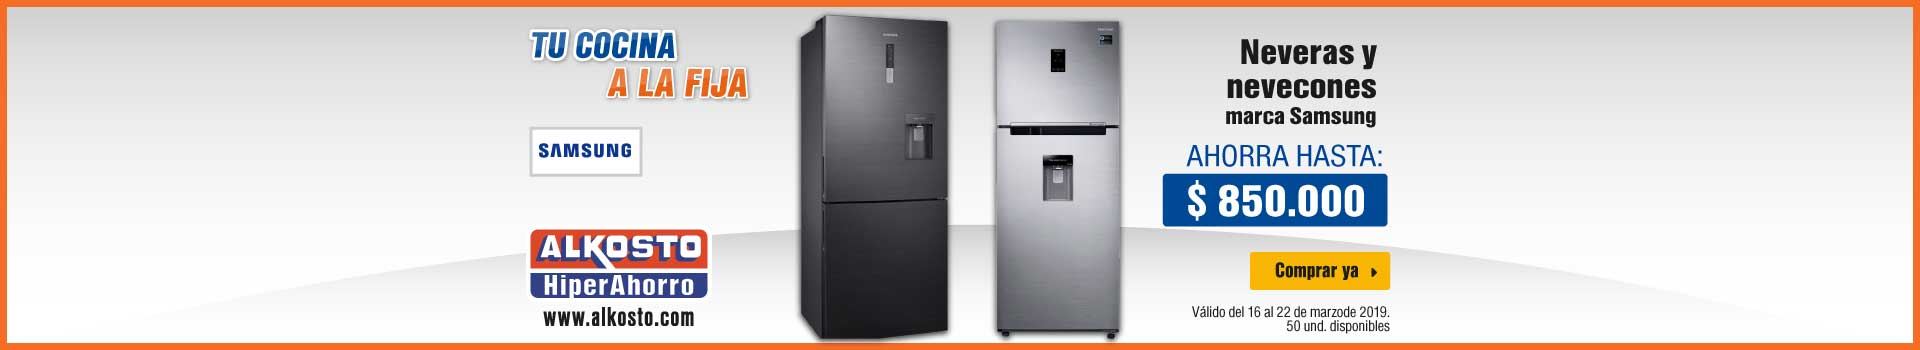 AK-KT-mayores-3-ELECT-BCAT-refrigeracion-samsung-160319-2